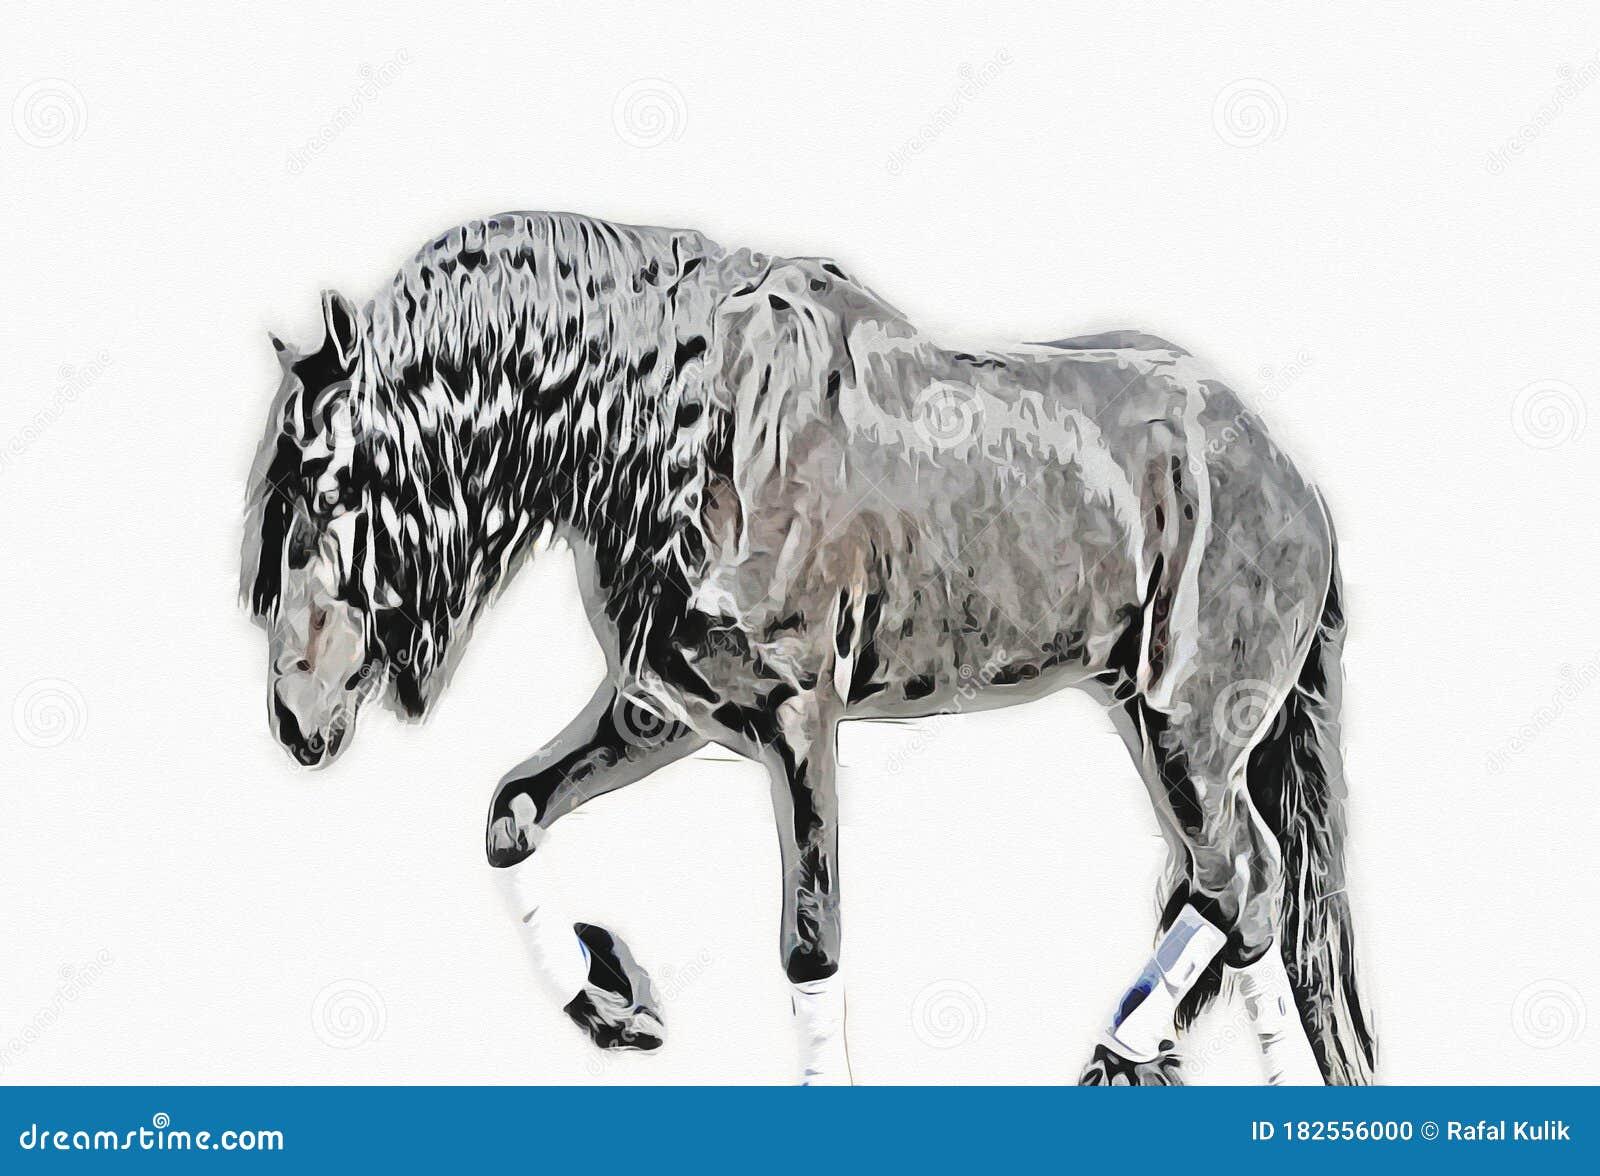 Colorful Horse Art Illustration Grunge Painting Stock Illustration Illustration Of Painting Grunge 182556000